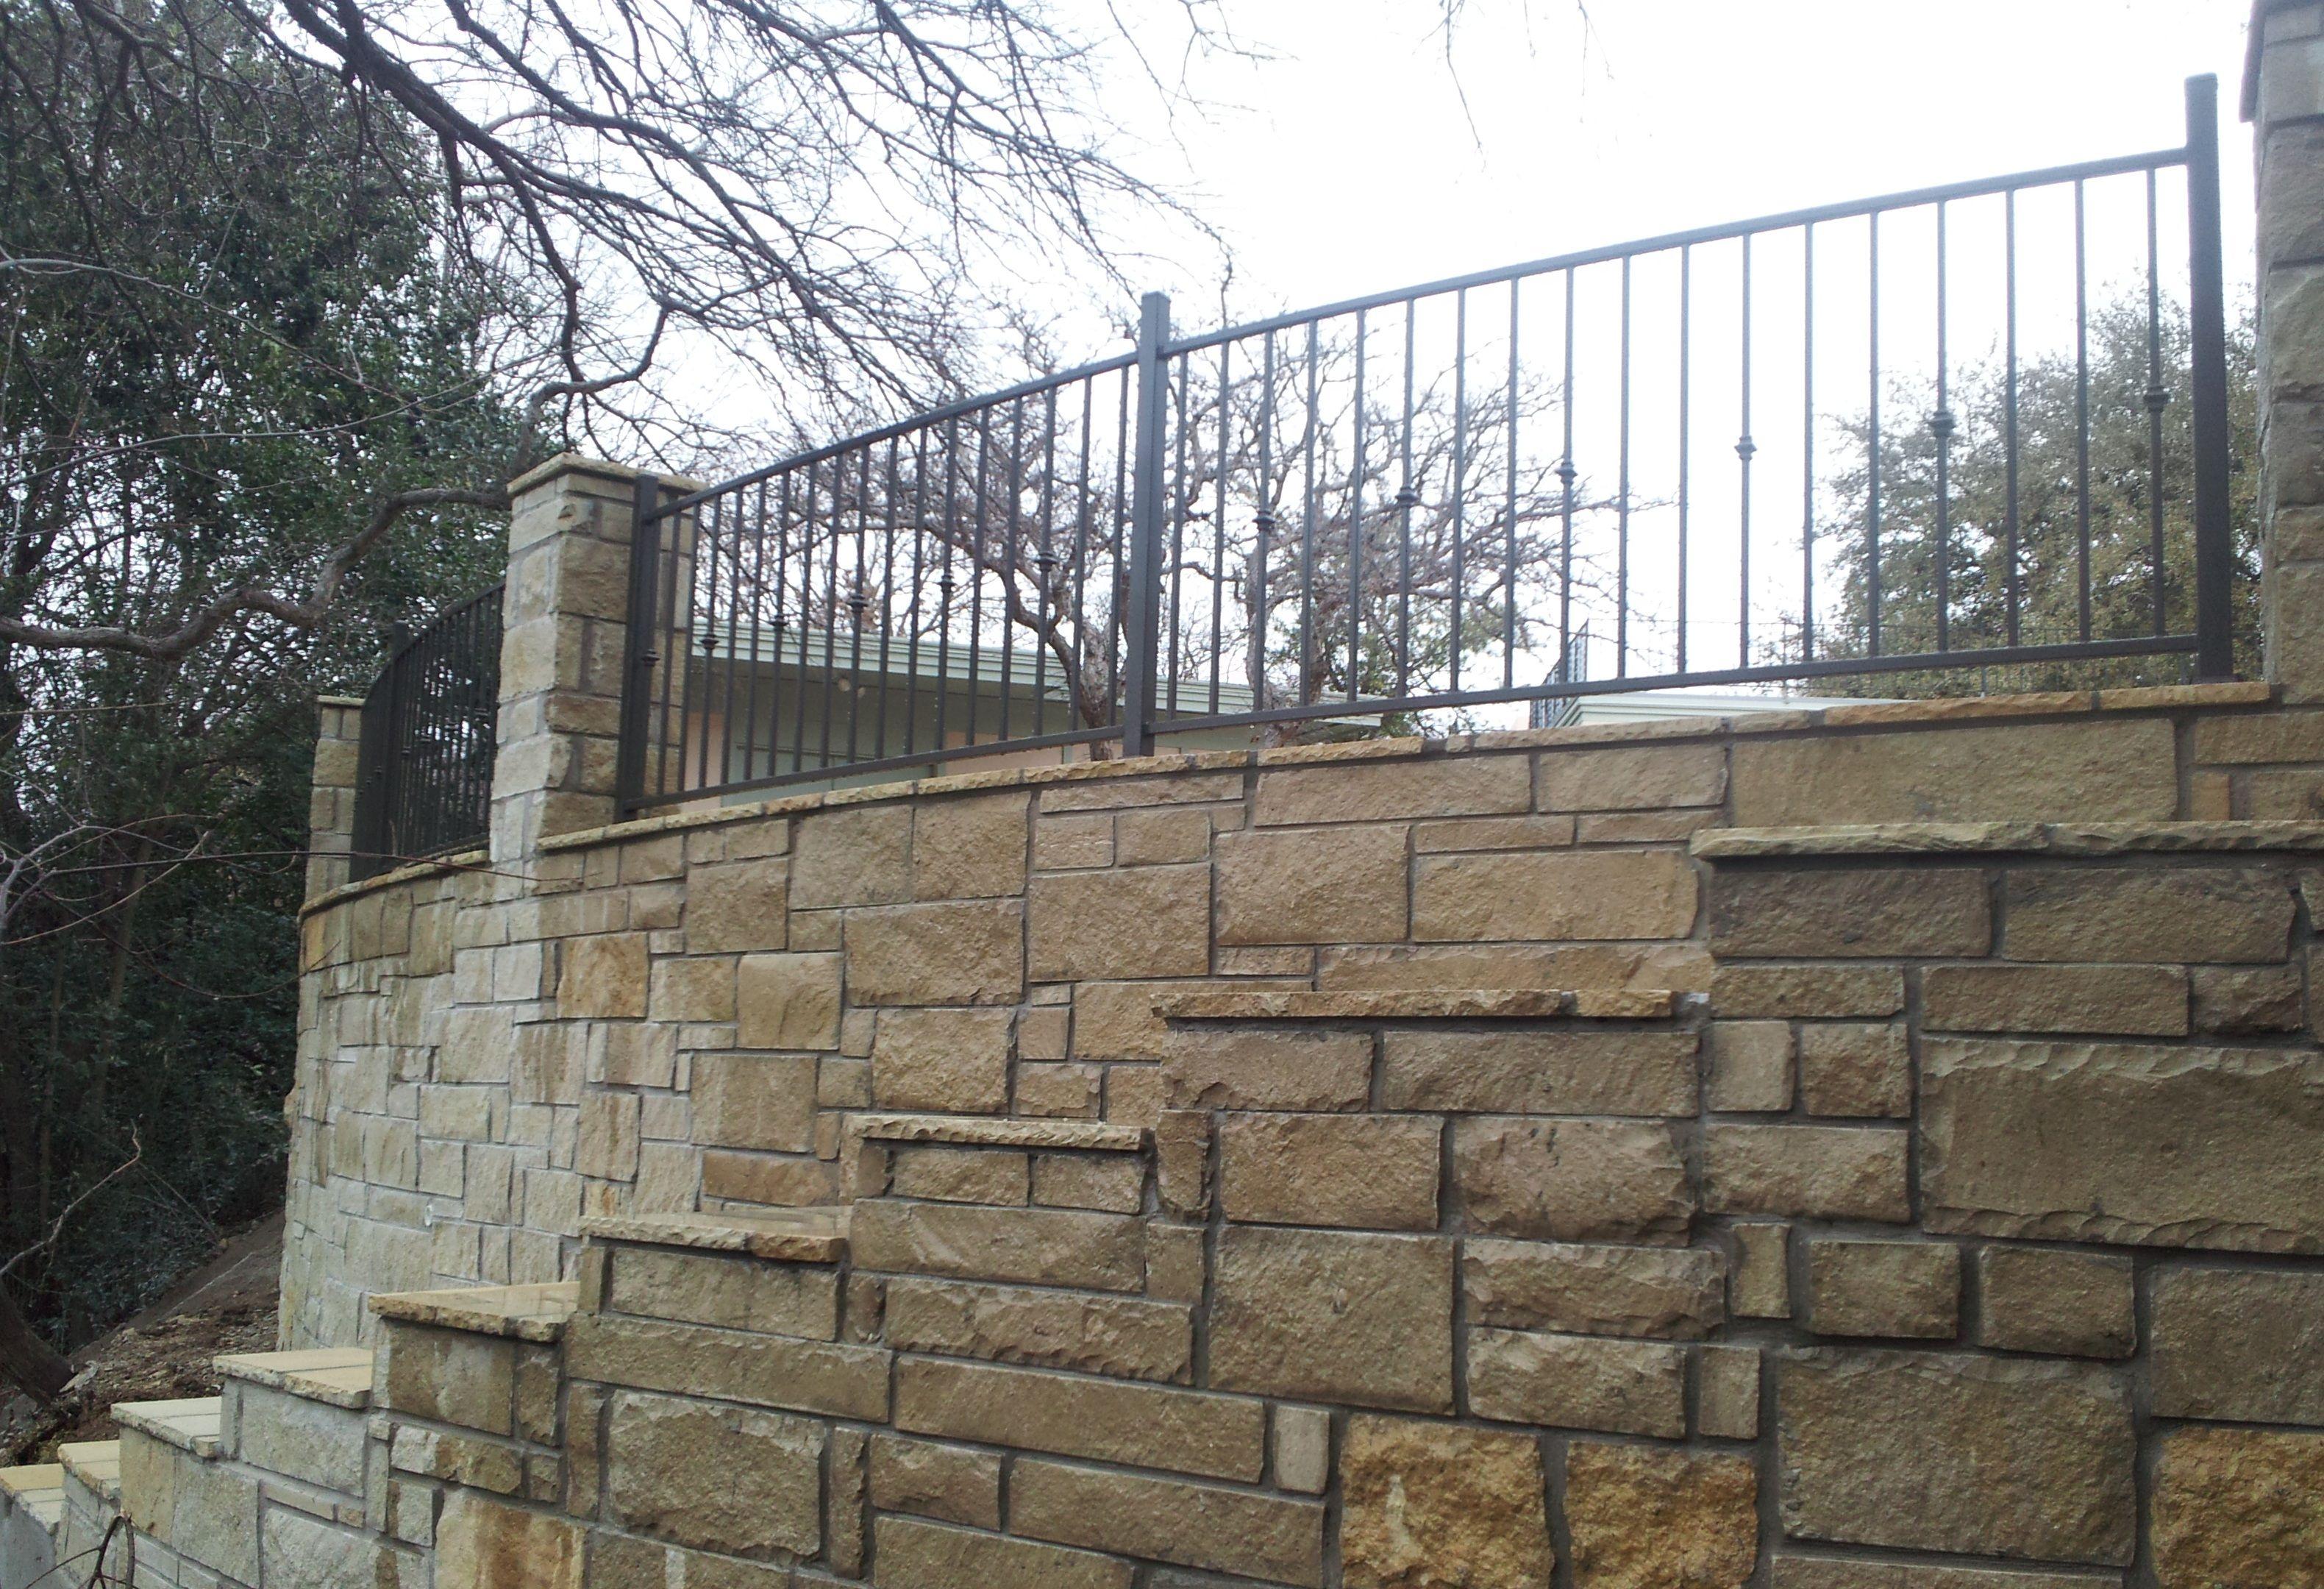 Reinforced Concrete Retaining Wall With Antique Leuder Stone Veneer Patio Stones Hardscape Concrete Retaining Walls